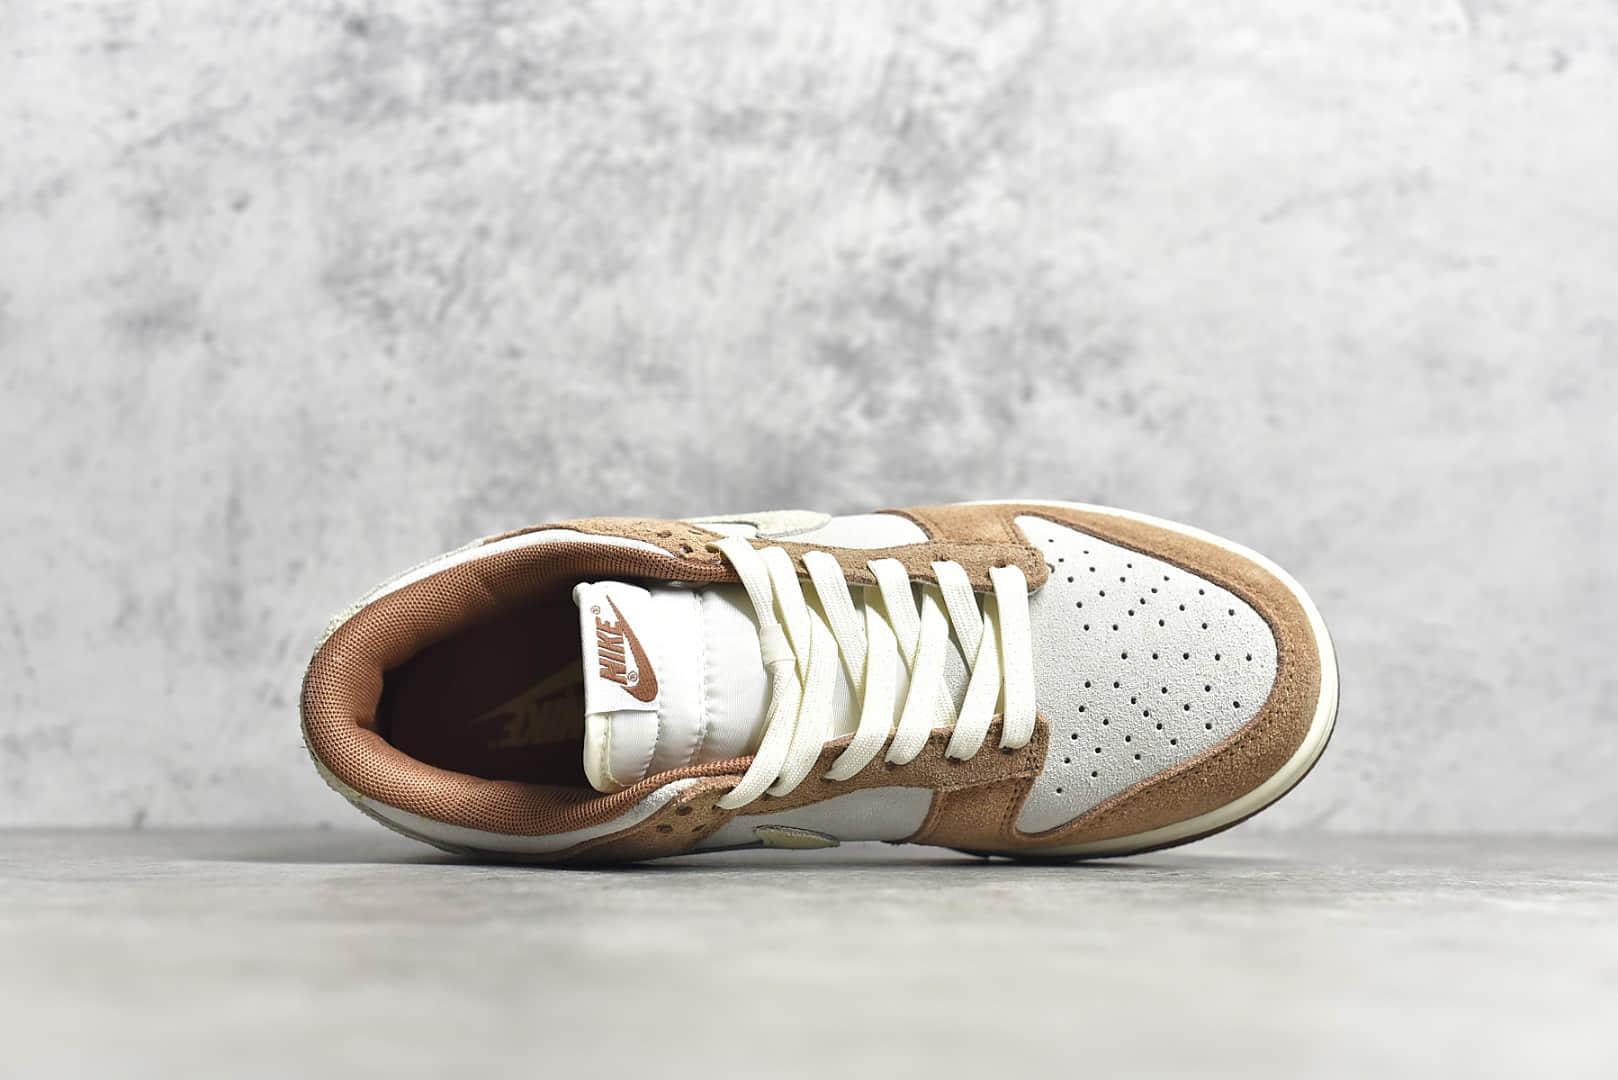 耐克Dunk SB米白棕低帮 Nike SB Dunk Low